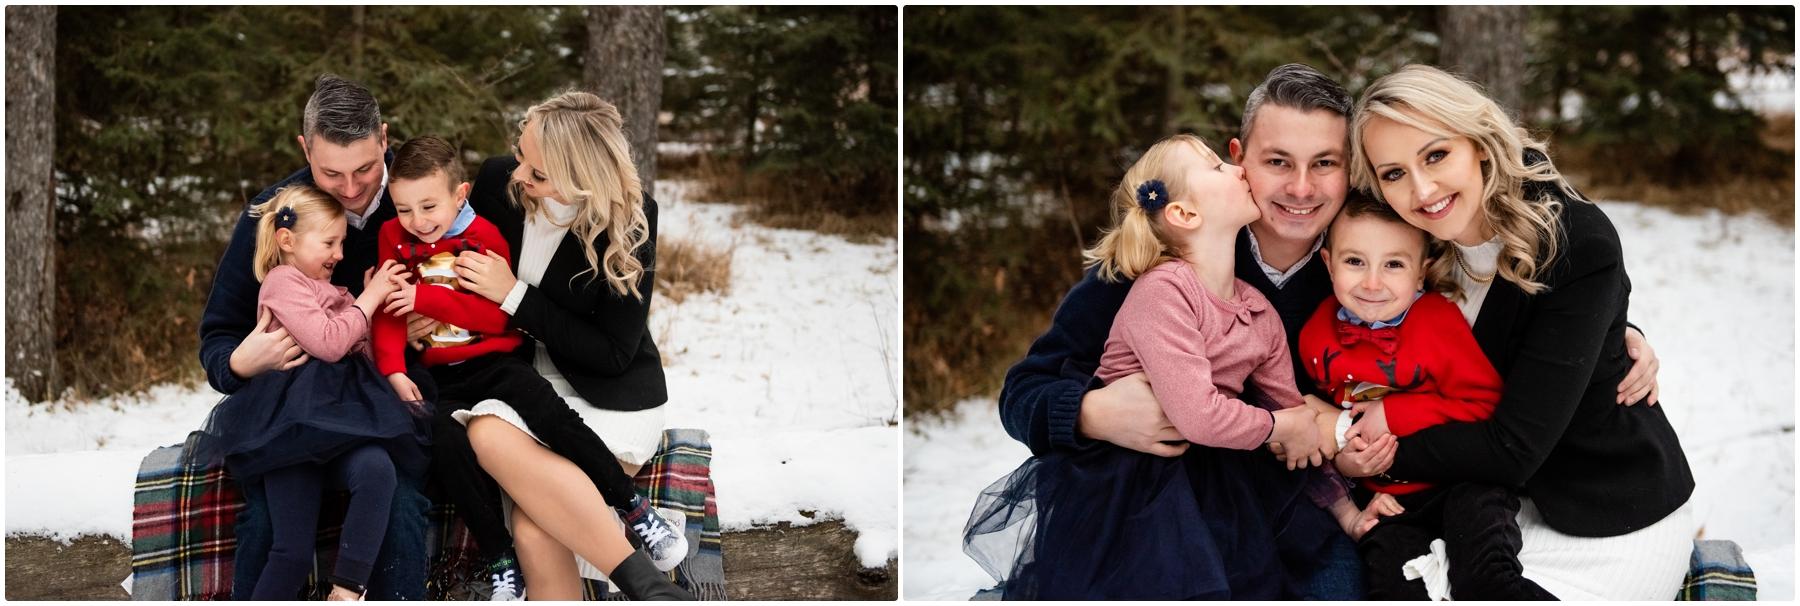 Calgary Winter Family Photographer - Bebo Grove Fish Creek Park.